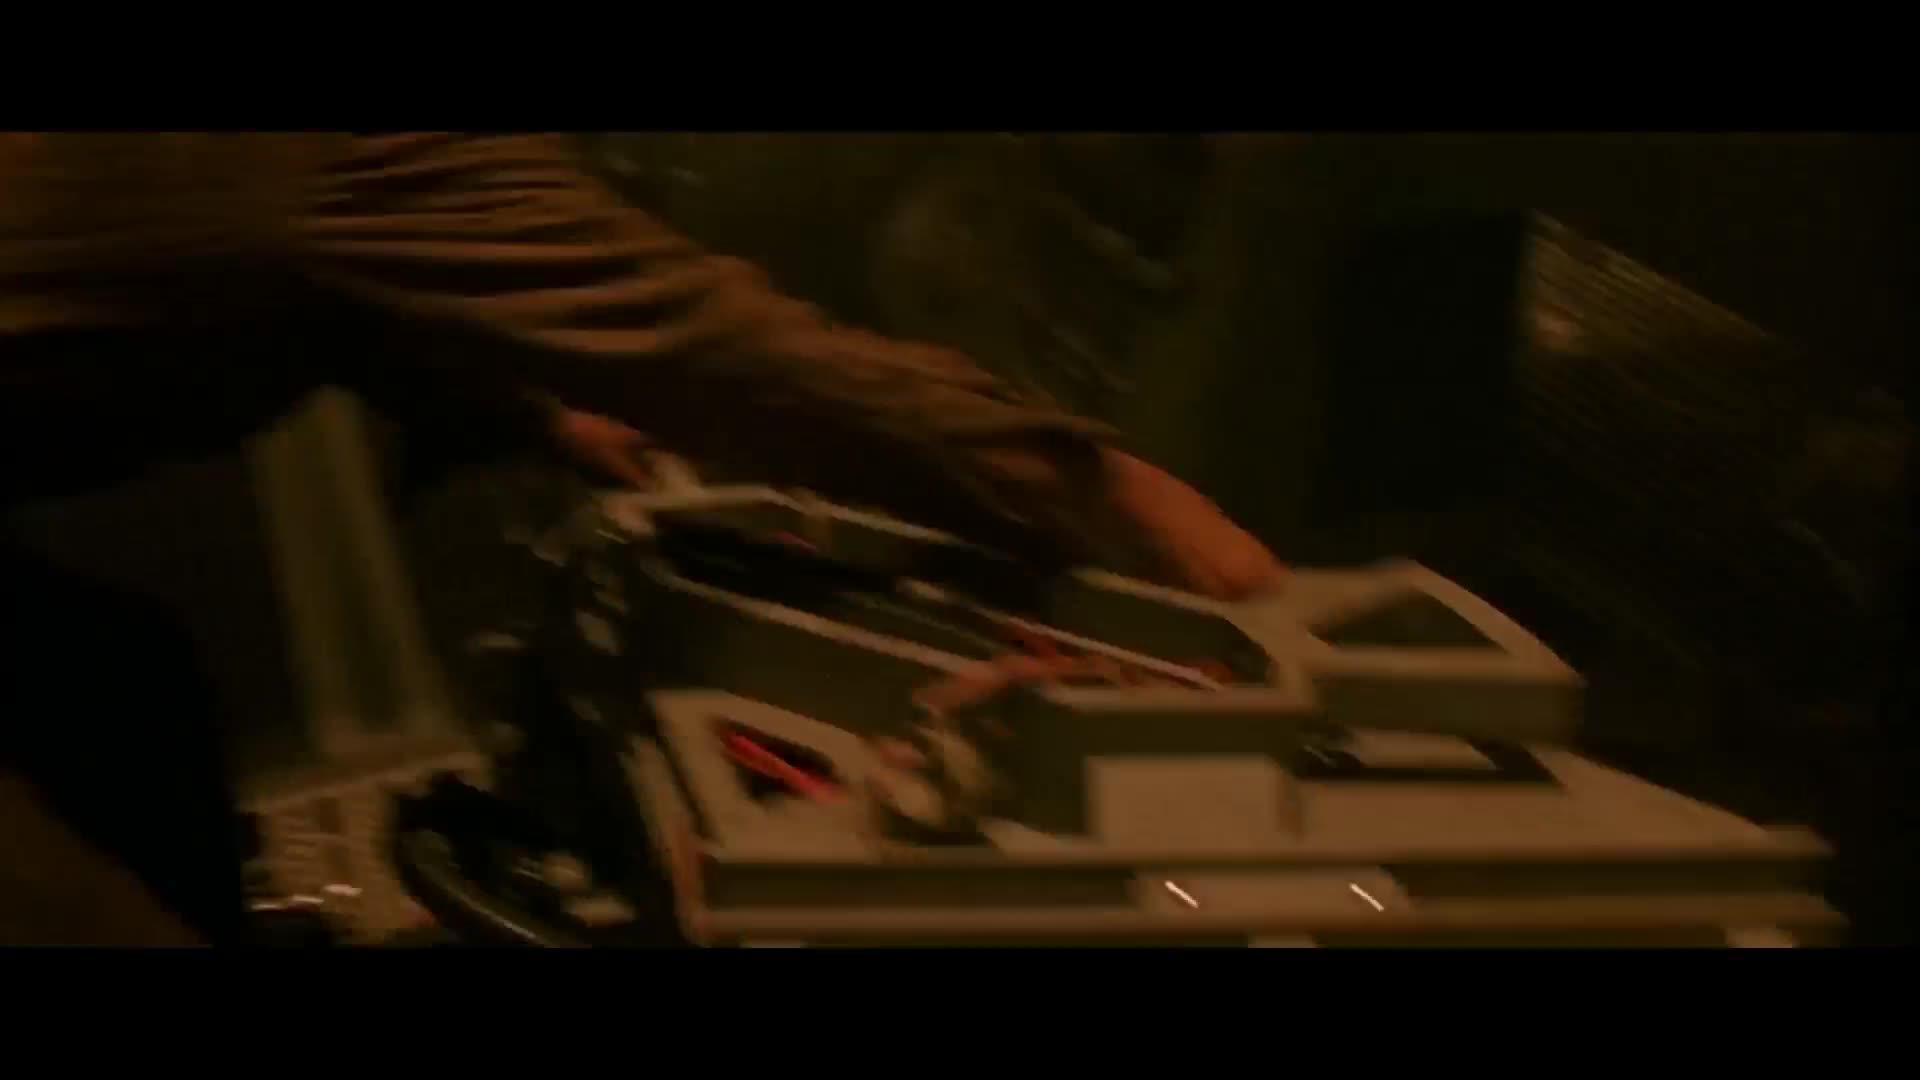 Pitch Black of Riddick ริดดิค 1 ฝูงค้างคาวฉลามสยองจักรวาล (2000)